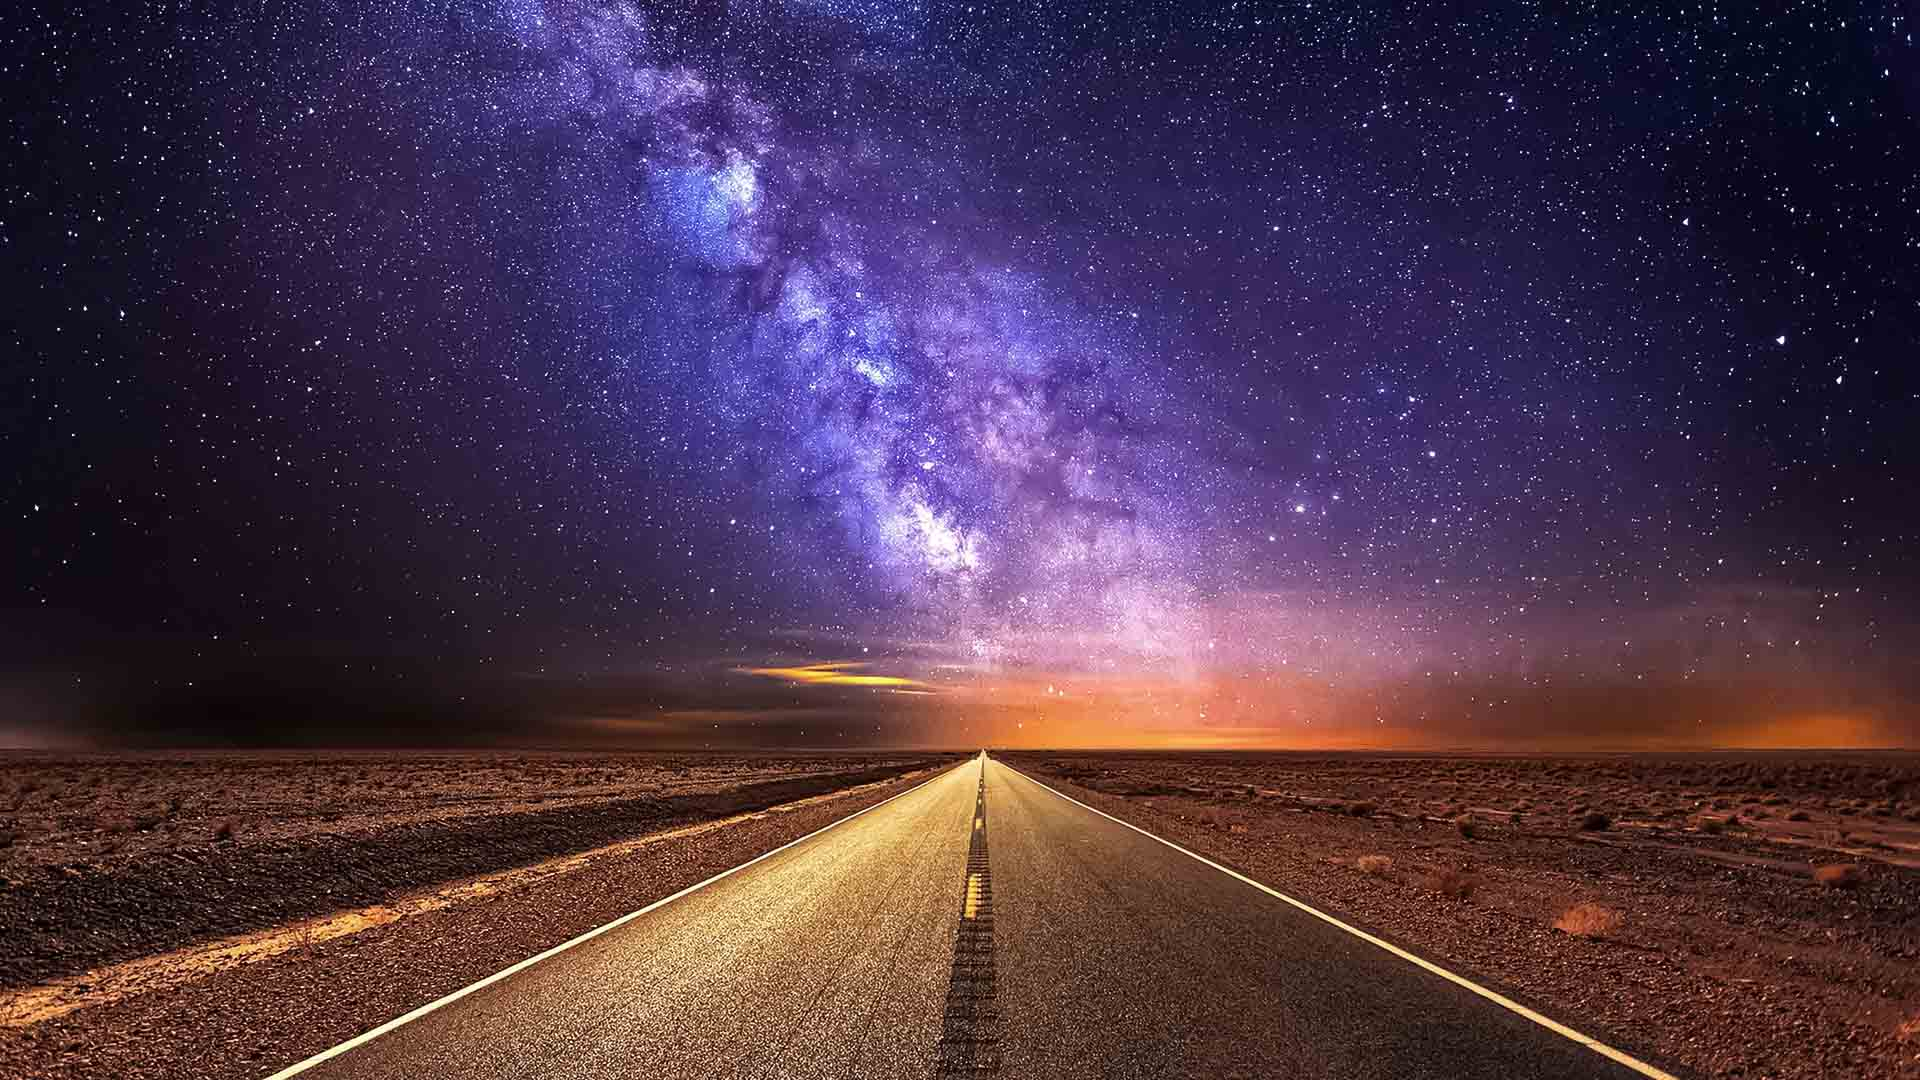 De sterrenhemel tijdens half januari 2021